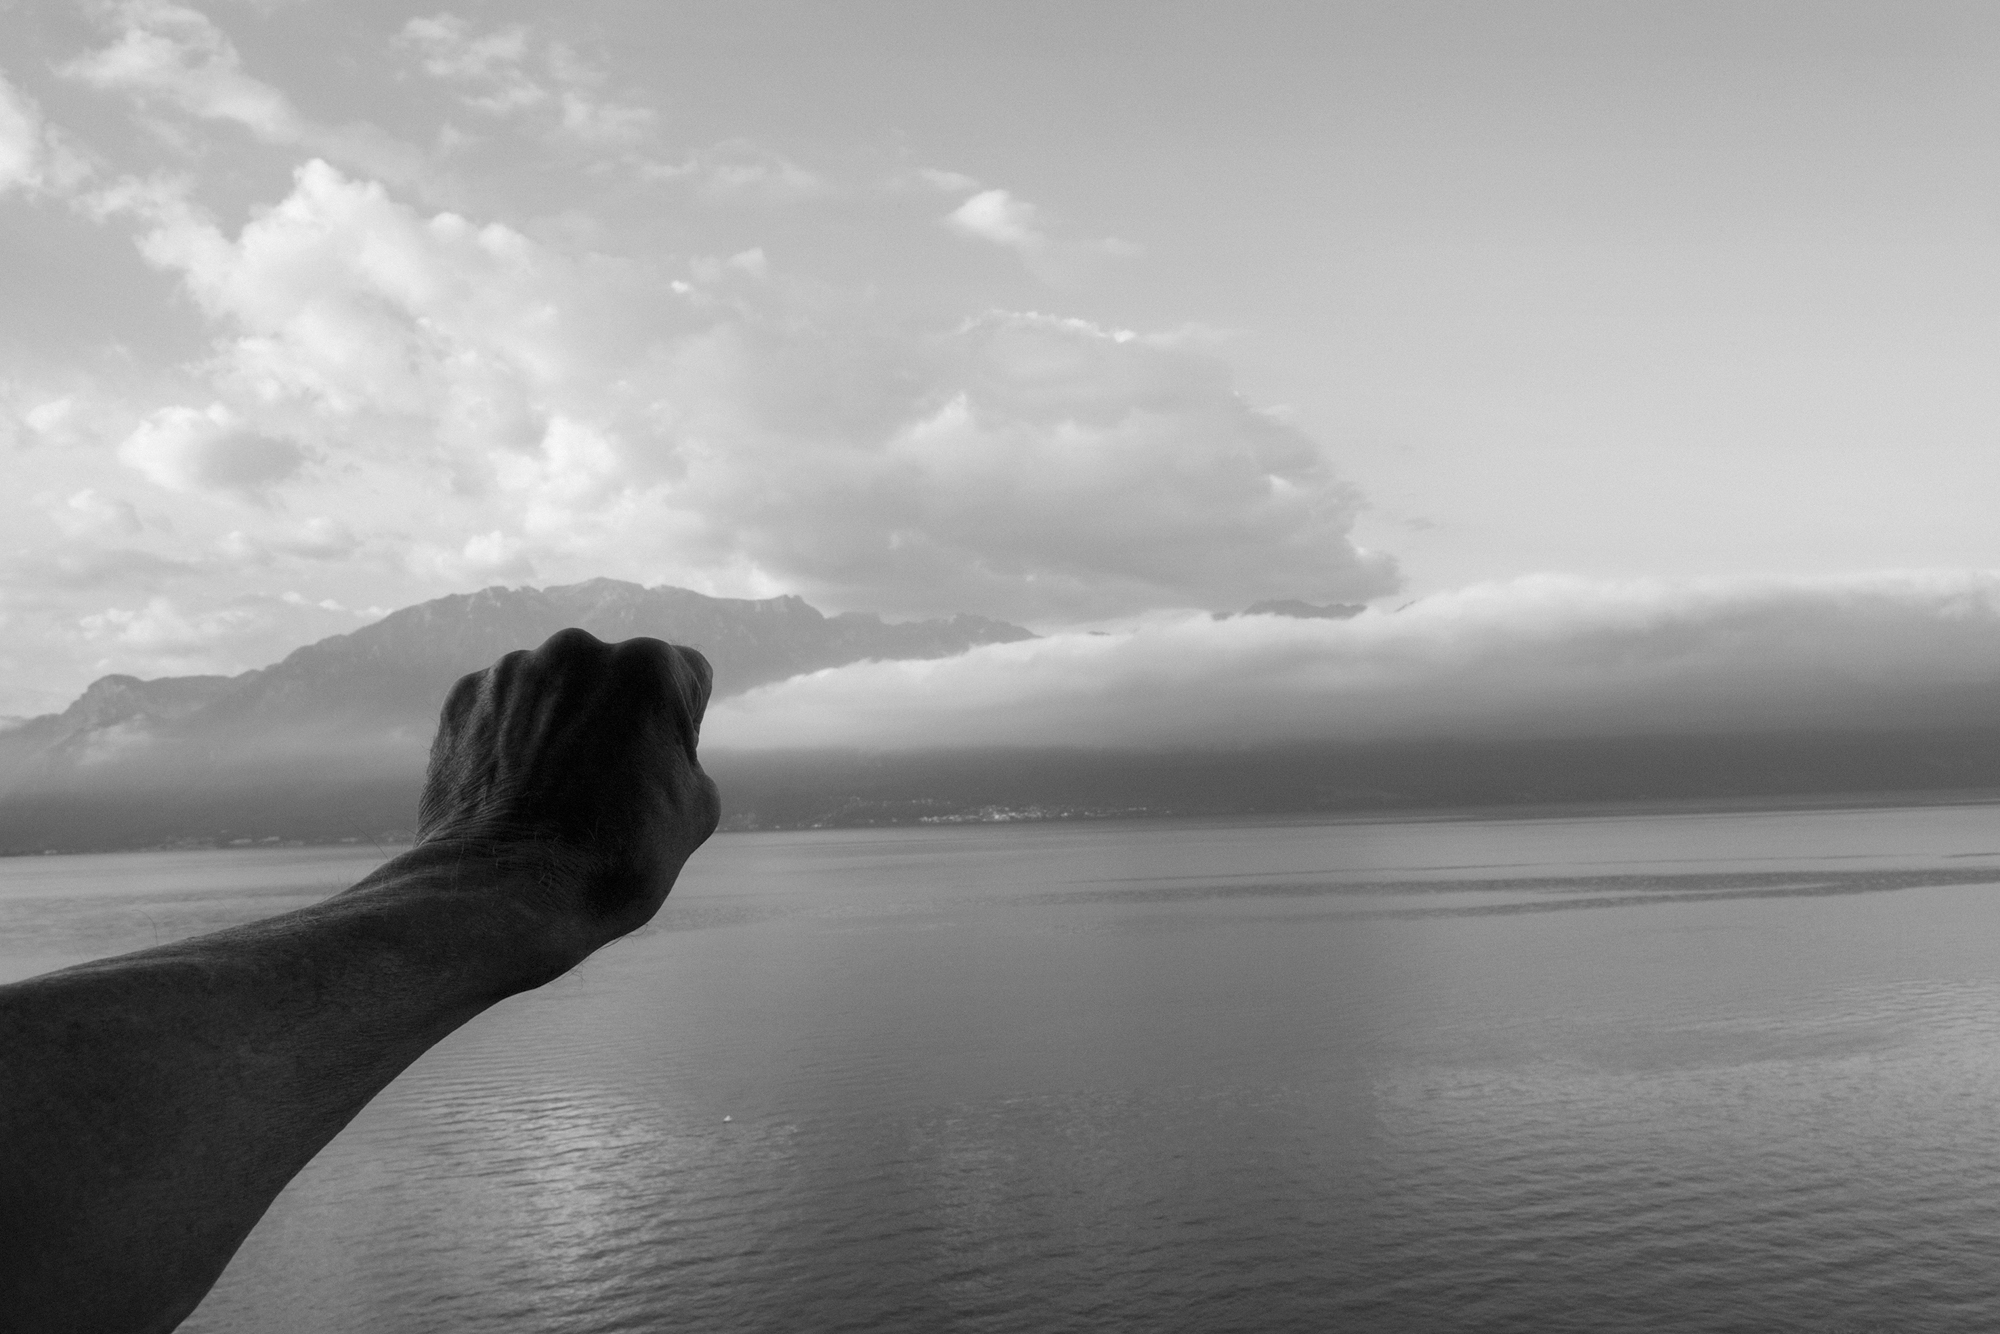 Arno Rafel Minkkinen - Cloudcatcher 2014